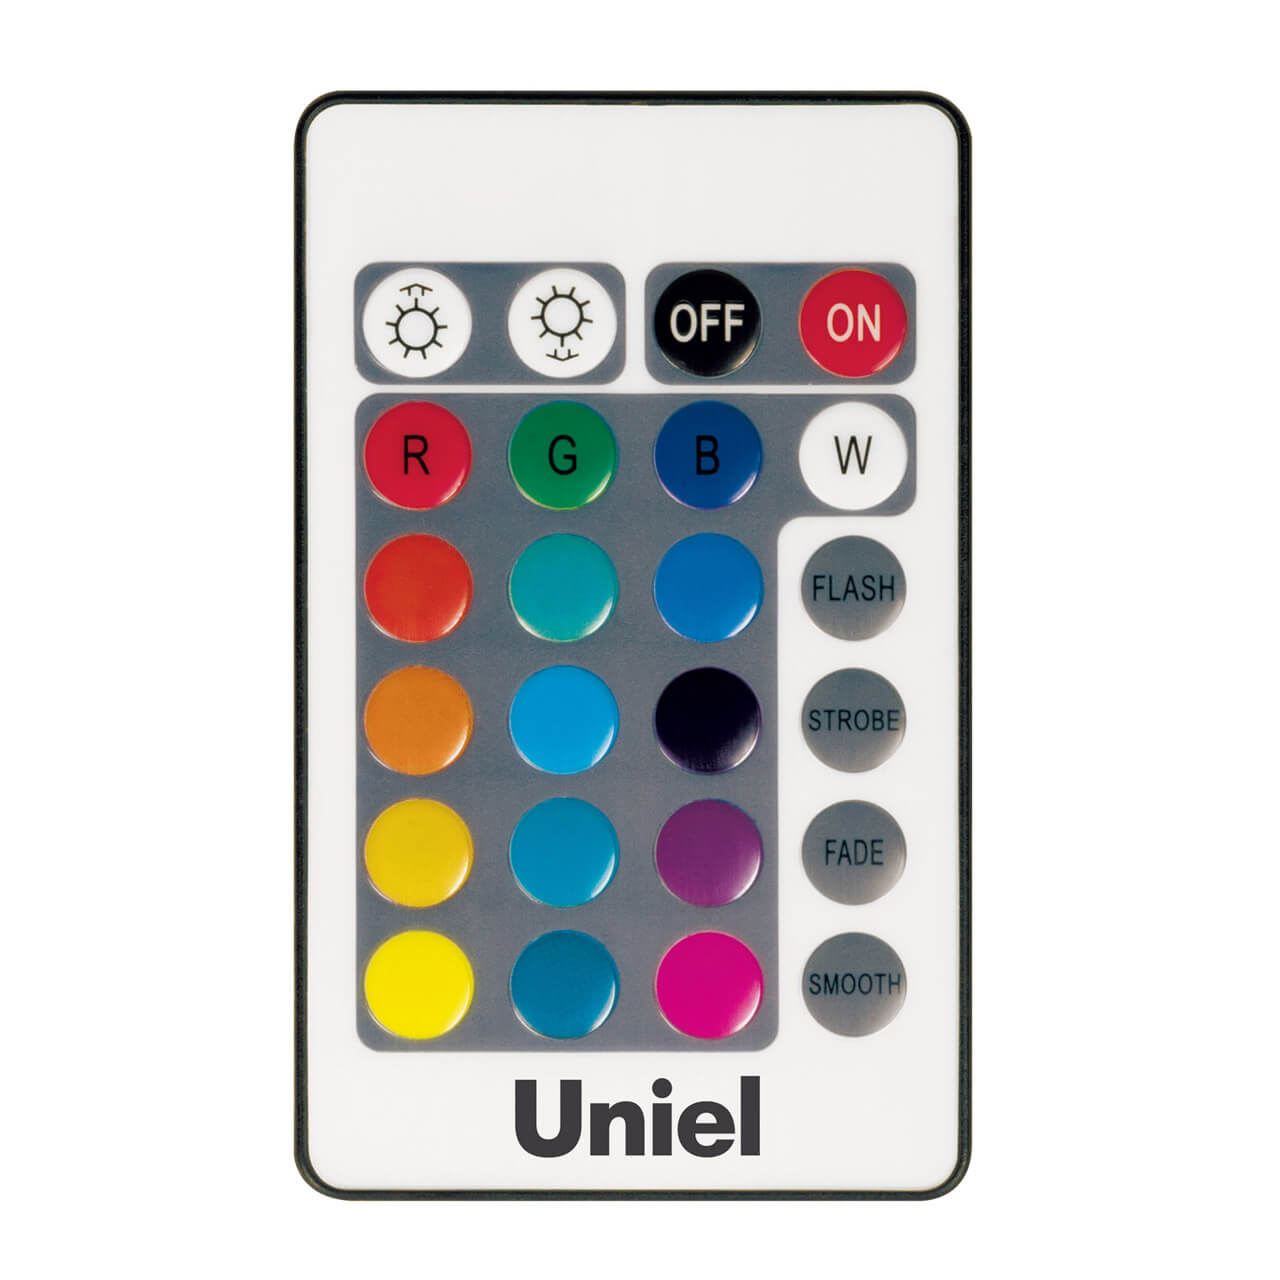 цена на Пульт управления Uniel UCH-S210 BLACK UCH